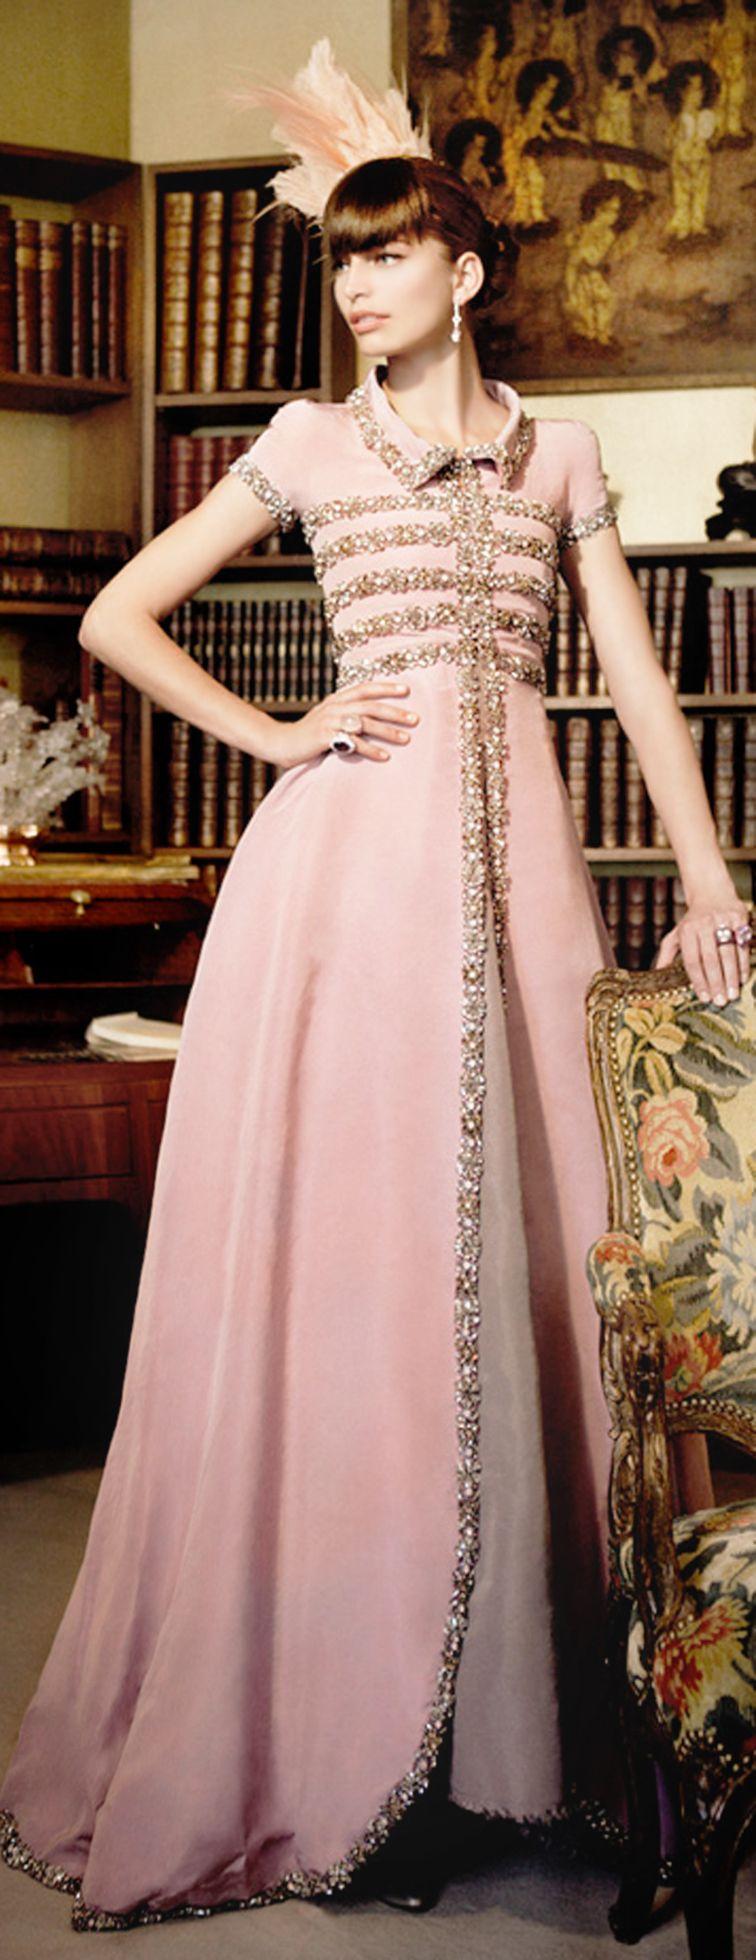 An Enchanted Evening- Chanel~ #LadyLuxuryDesigns | Vestido coctel ...